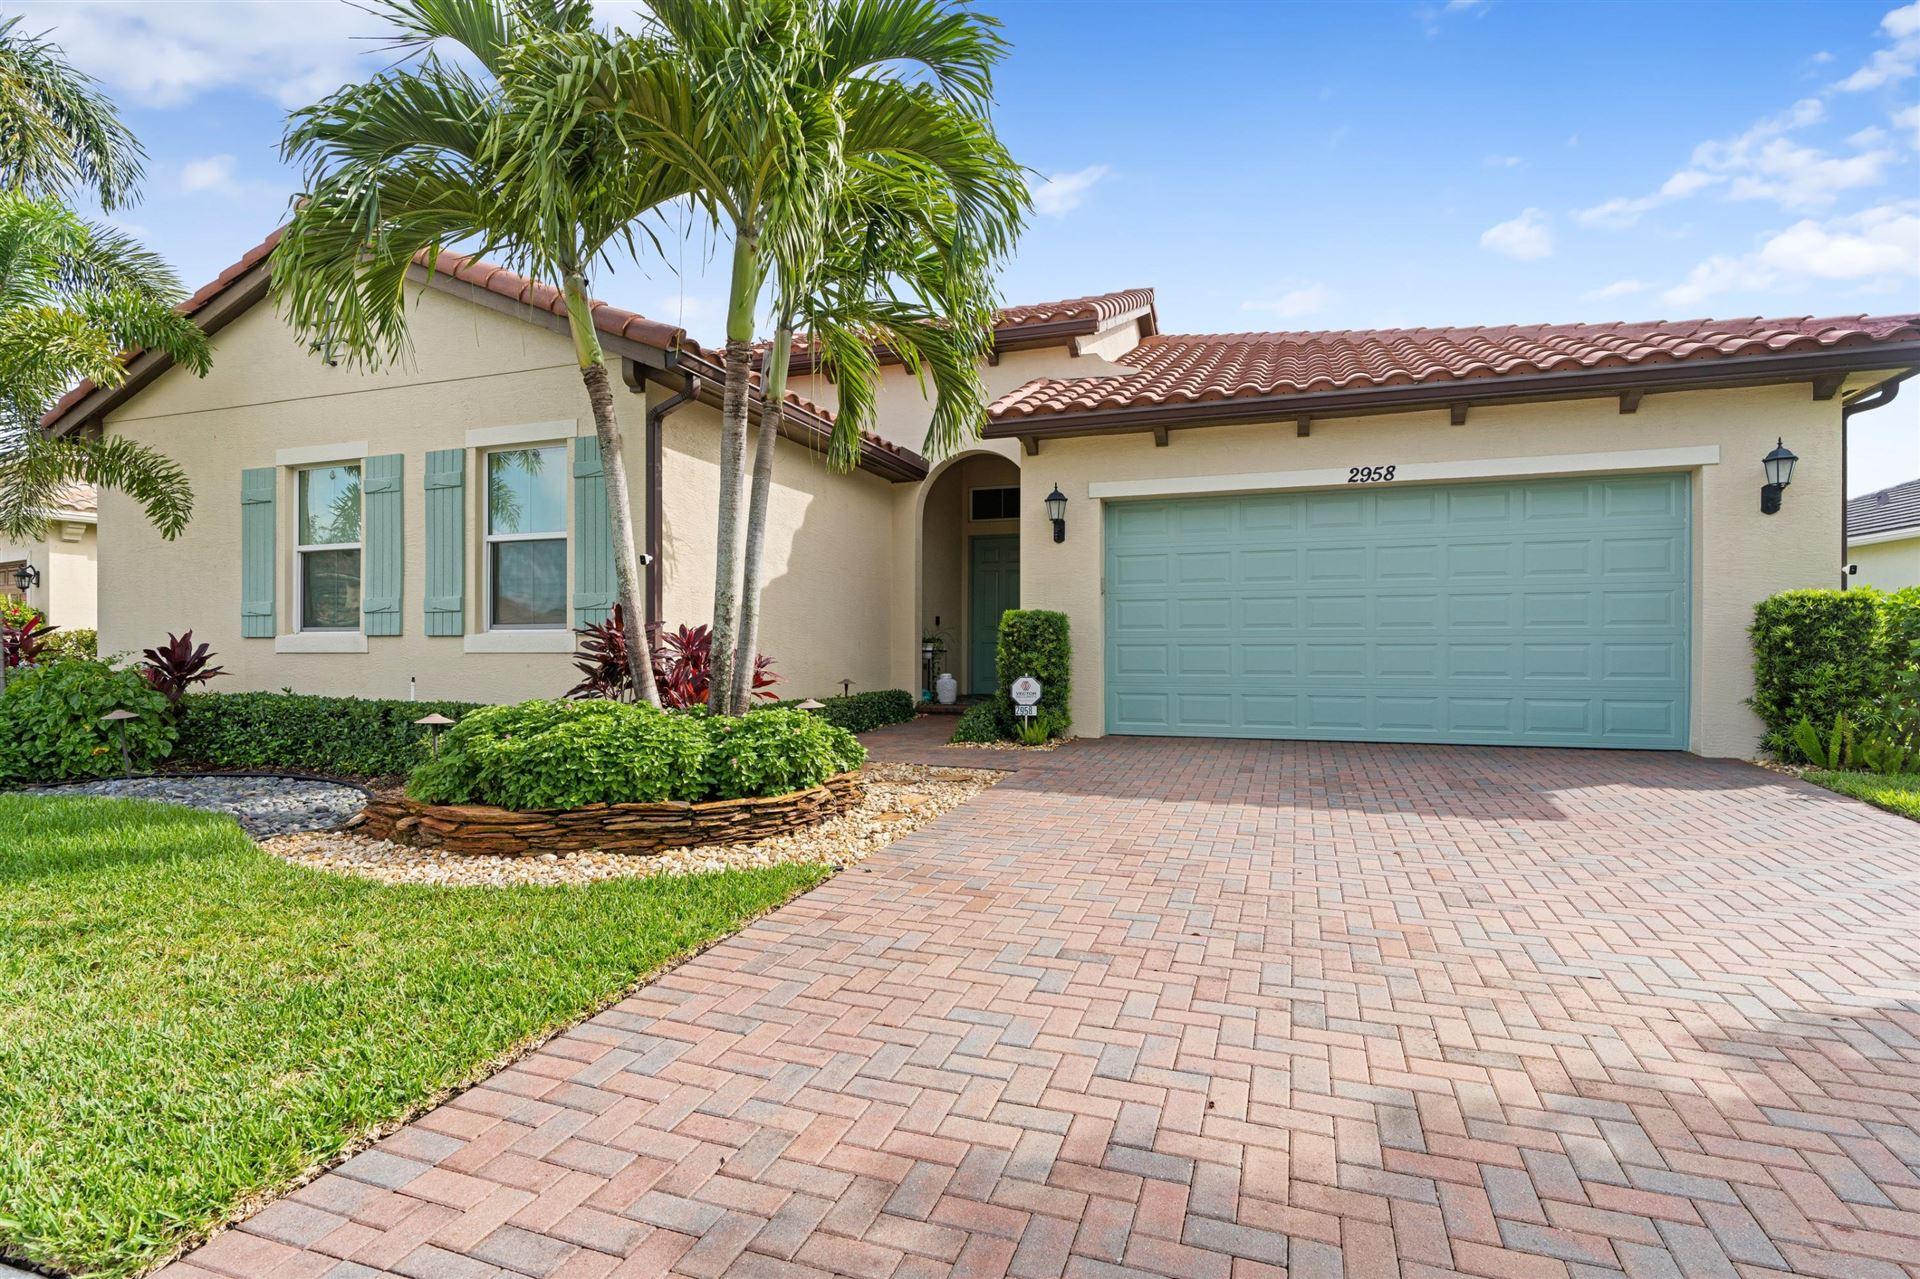 Photo of 2958 Bellarosa Circle, Royal Palm Beach, FL 33411 (MLS # RX-10736174)